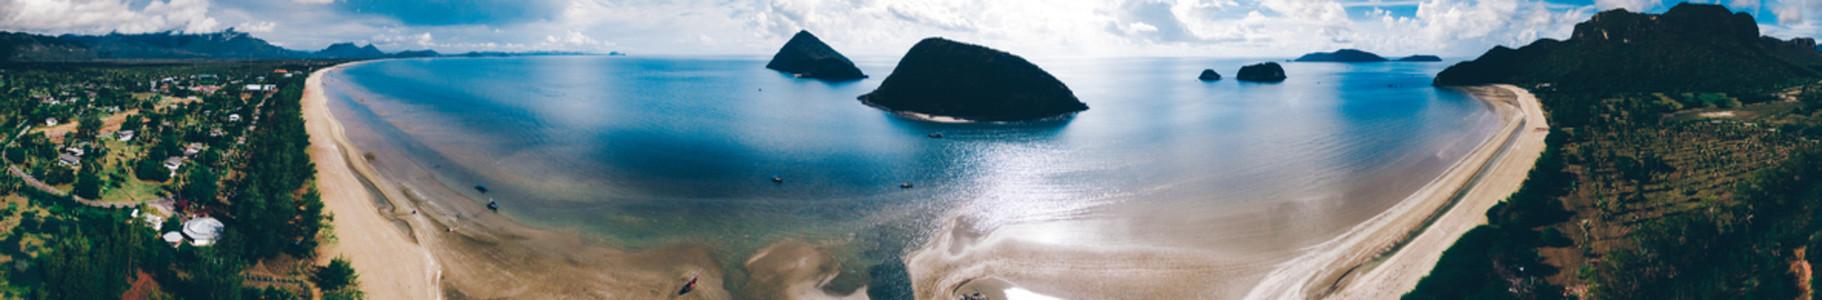 Drone Beach Panorama